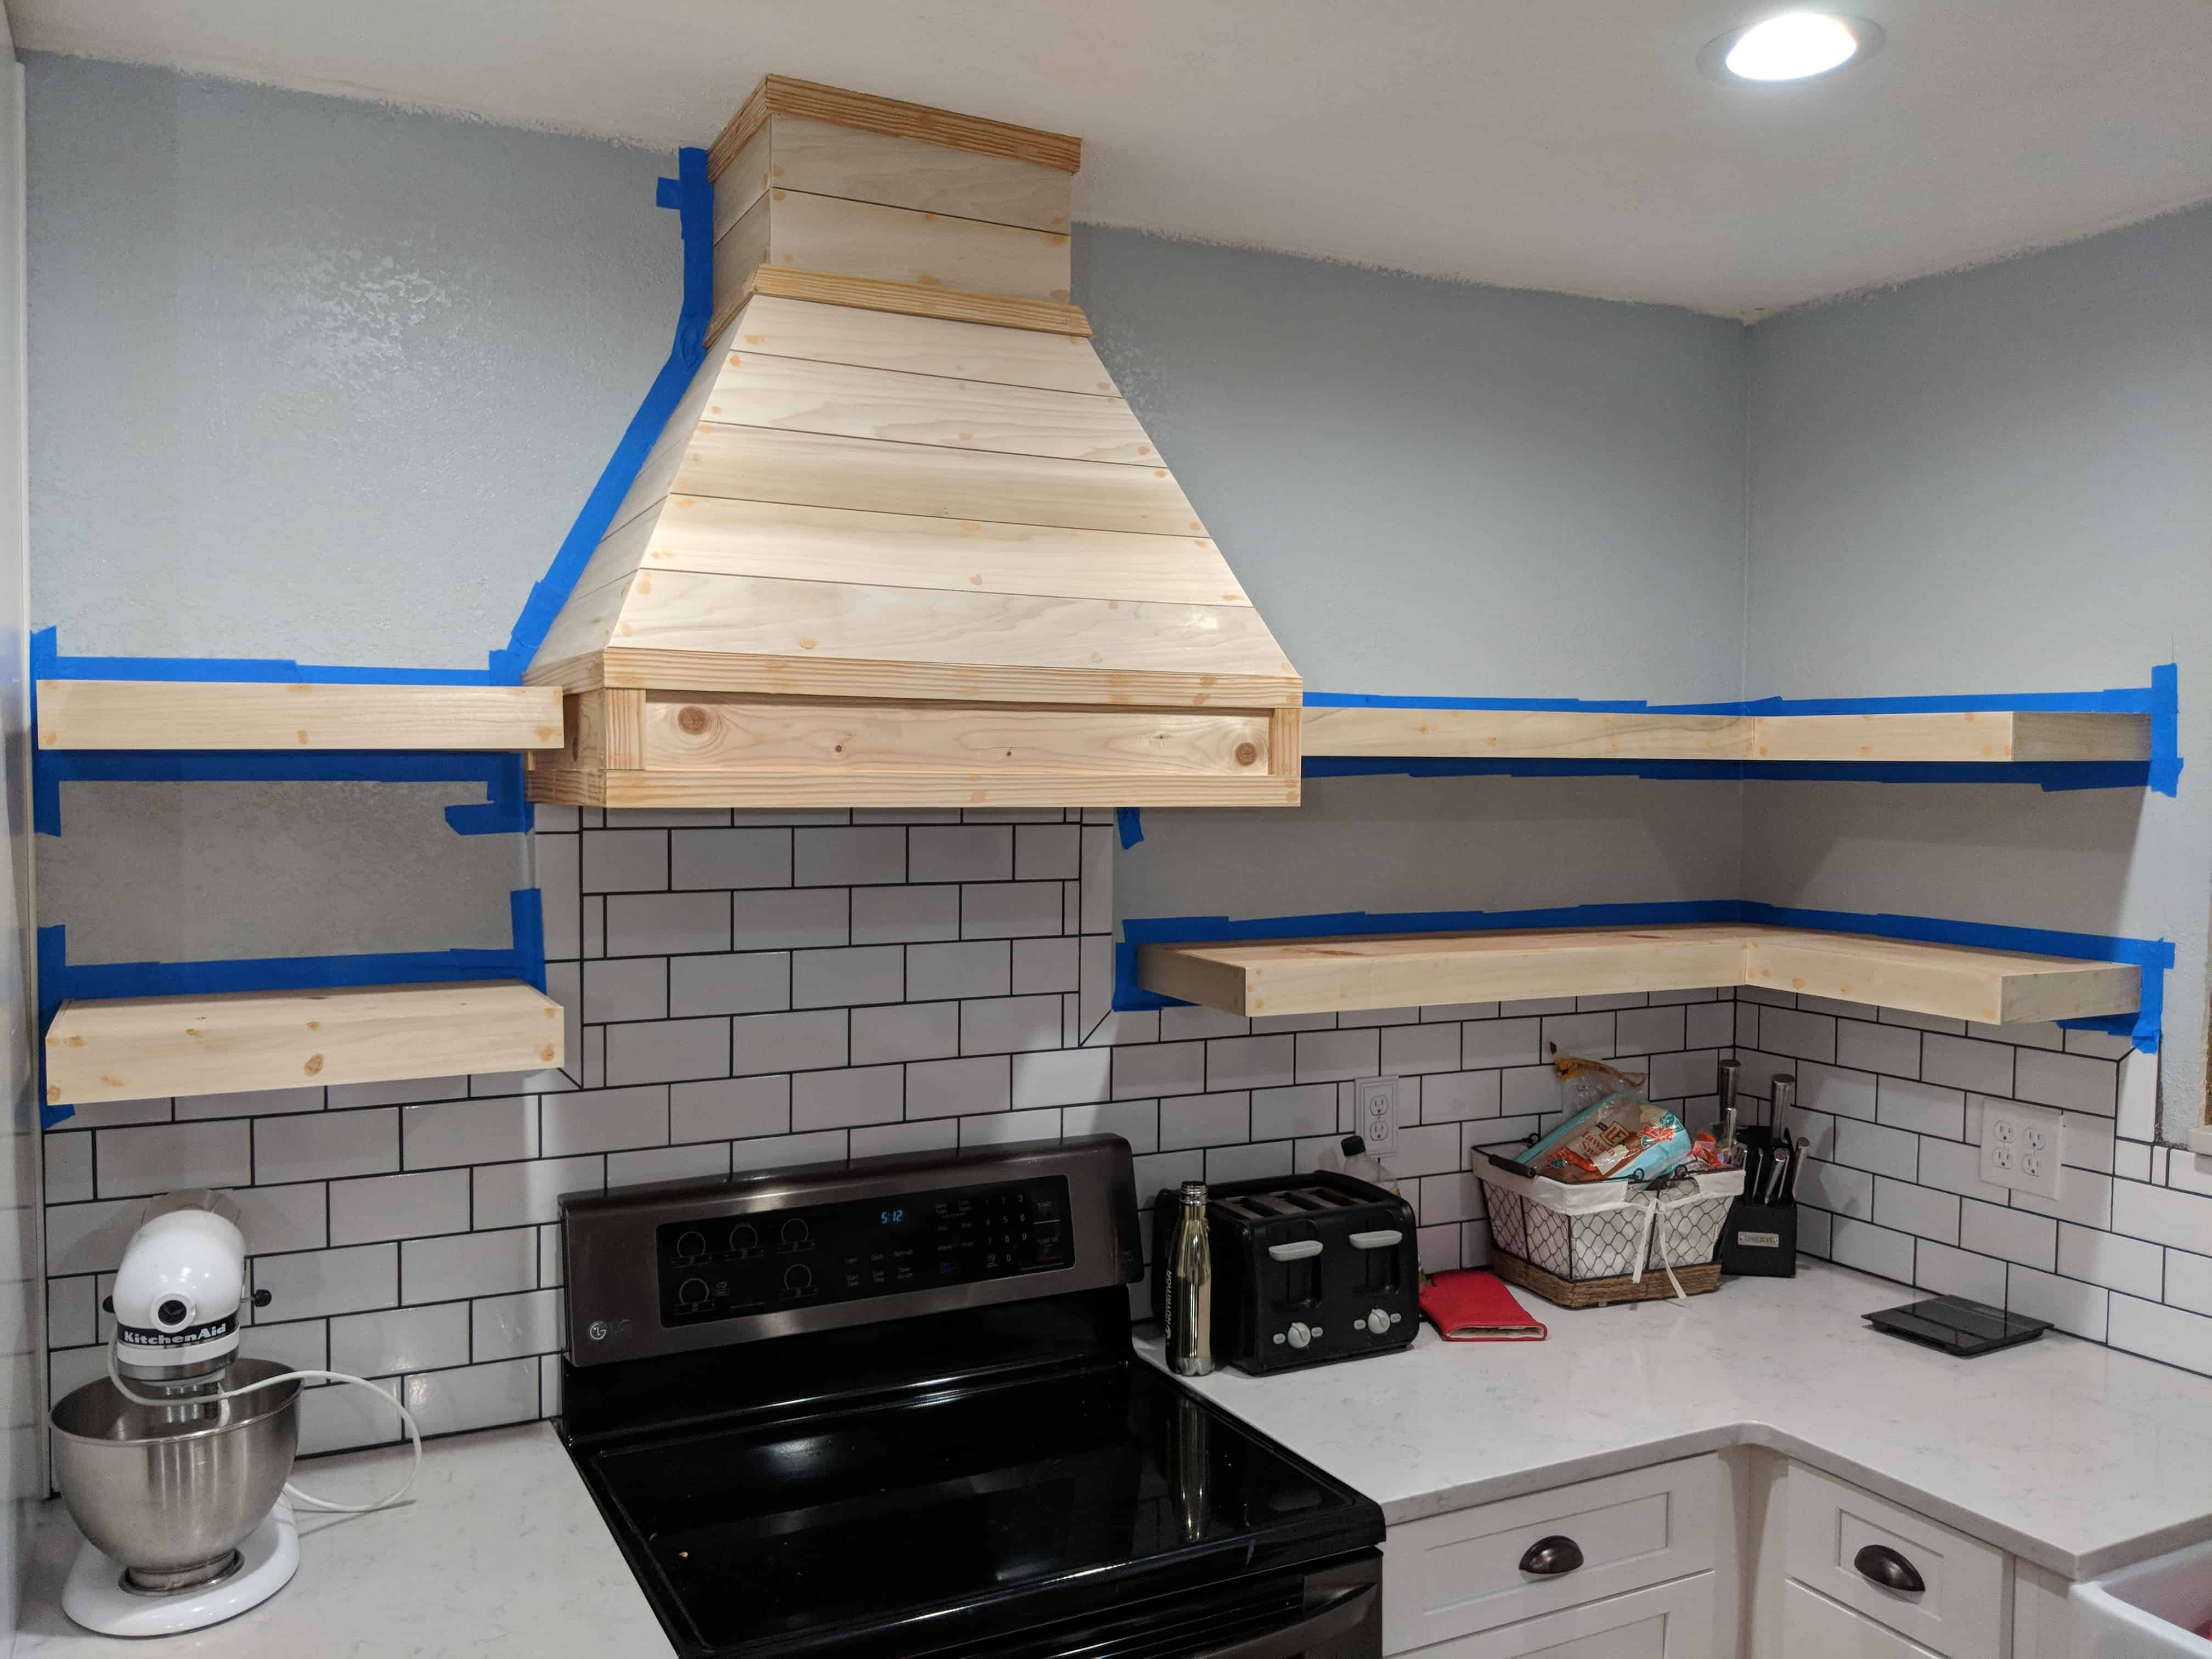 Wooden Hood Vent Kitchen Vent Hood Kitchen Vent Vent Hood